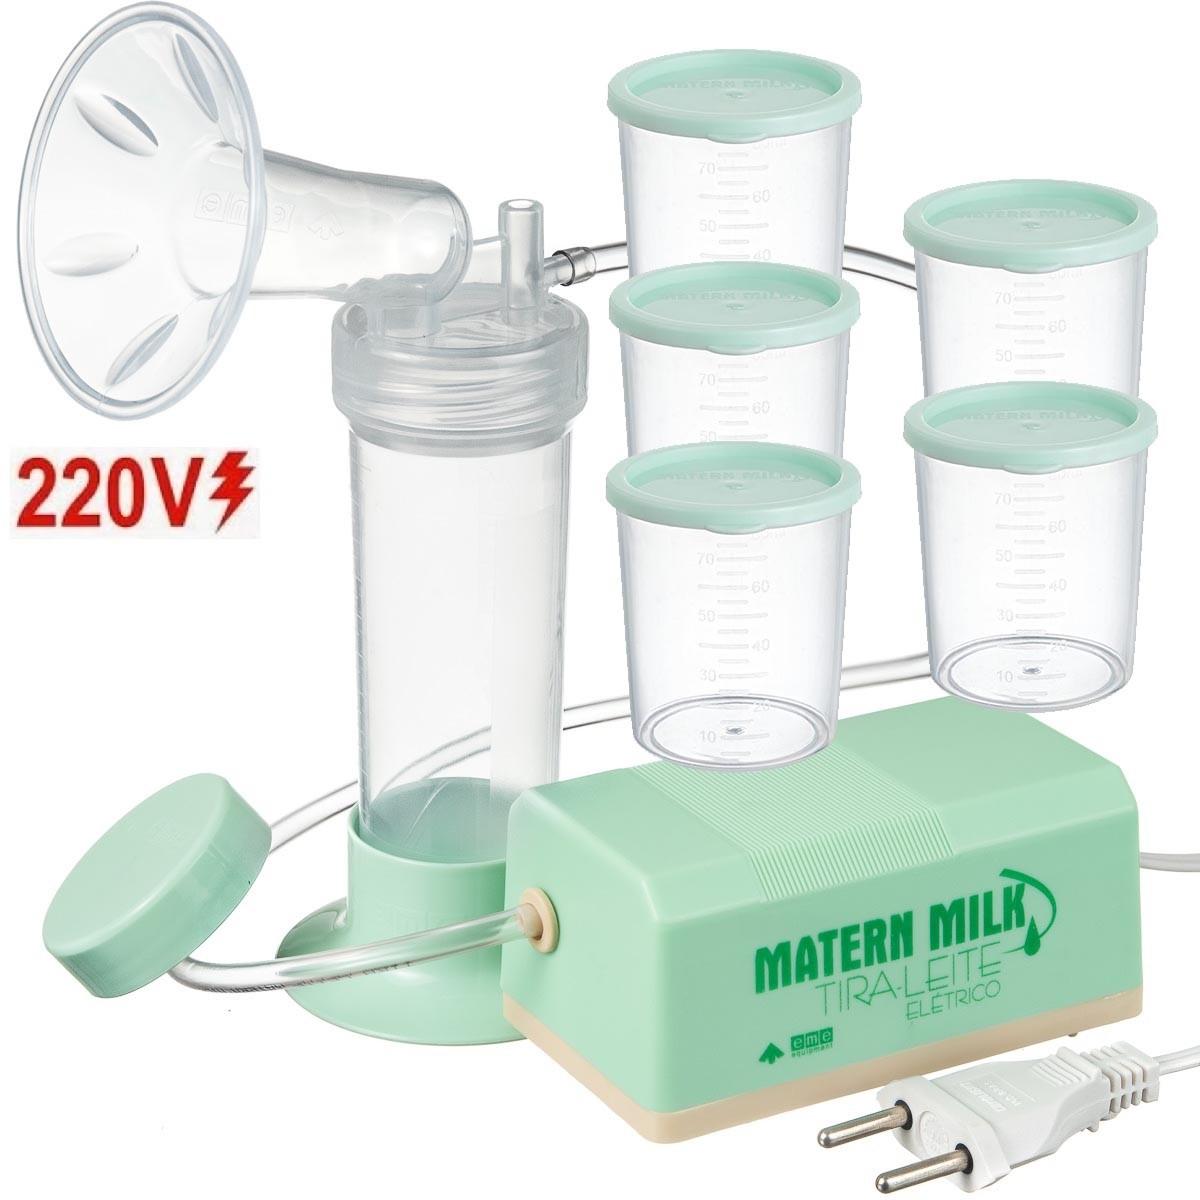 Bomba tira leite elétrico 220 V Verde - Matern Milk +5 Copos